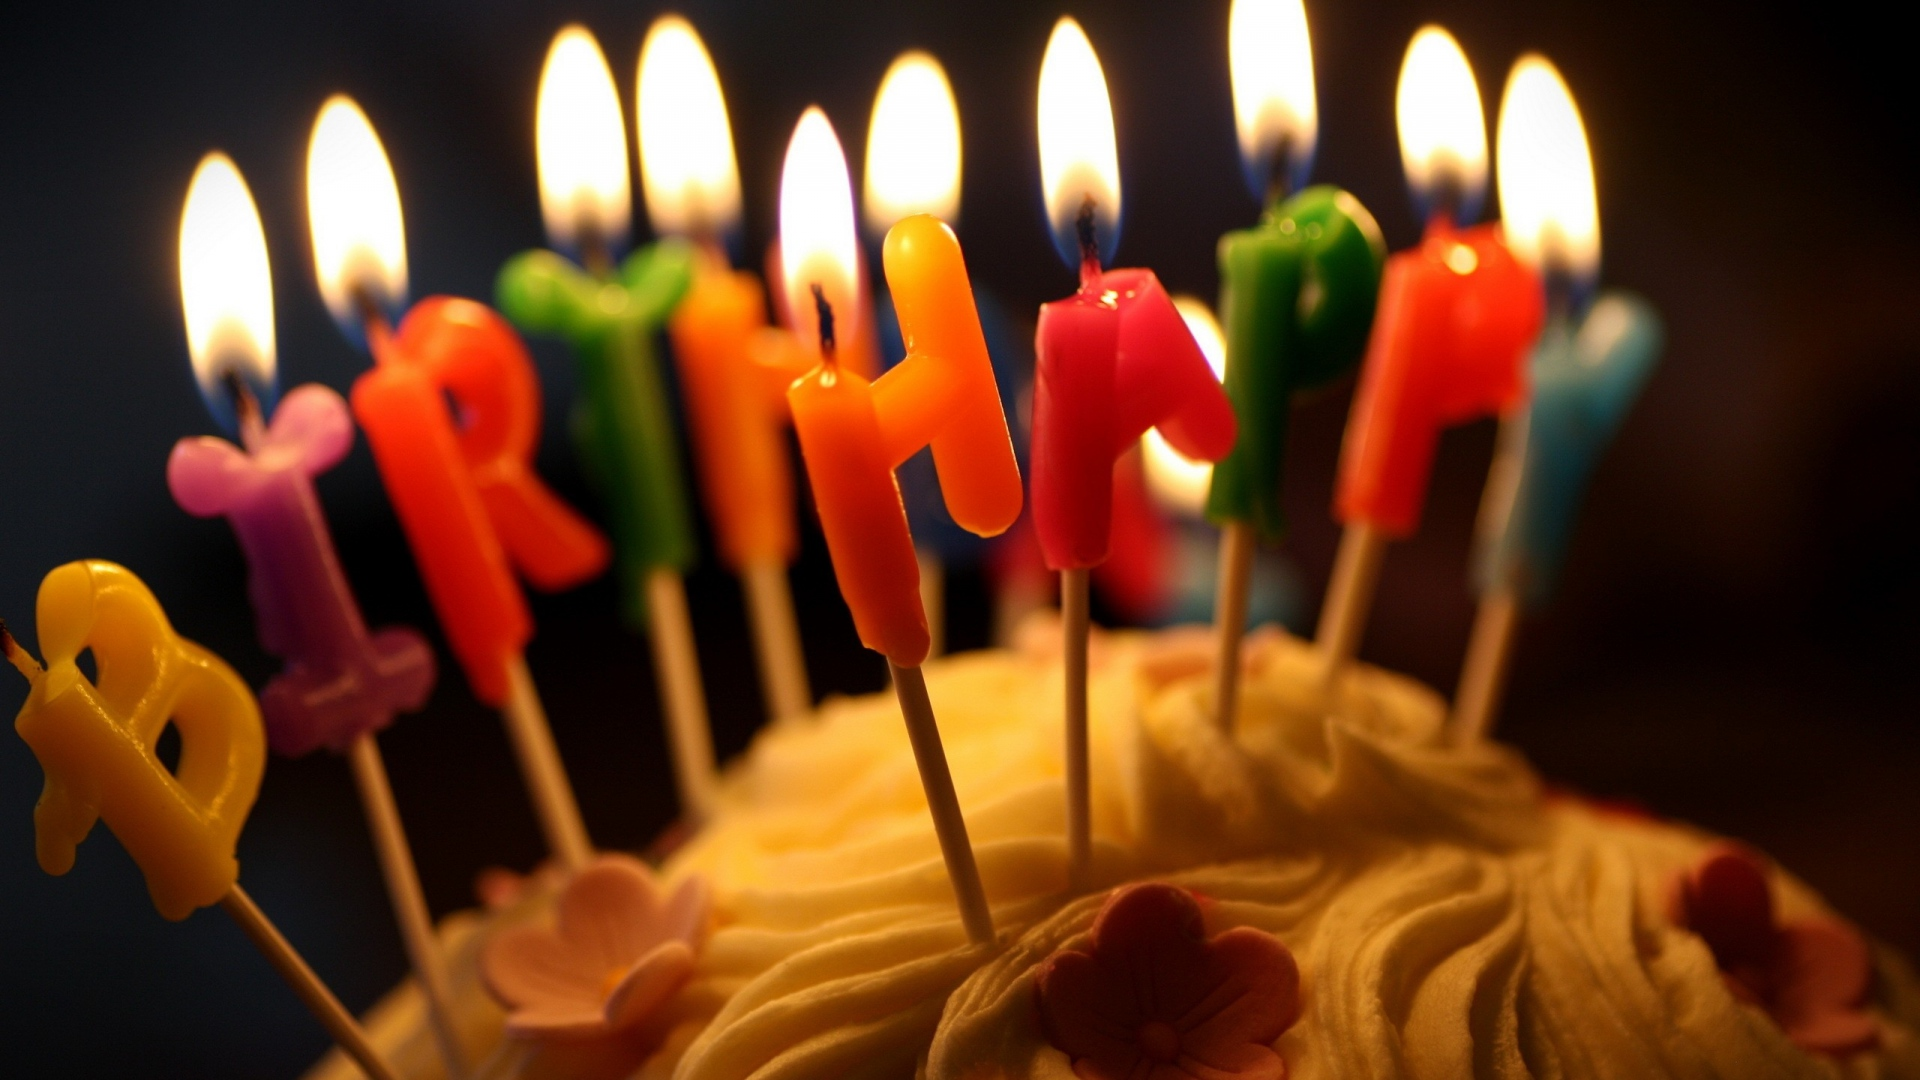 happy birthday candles wallpaper 49192